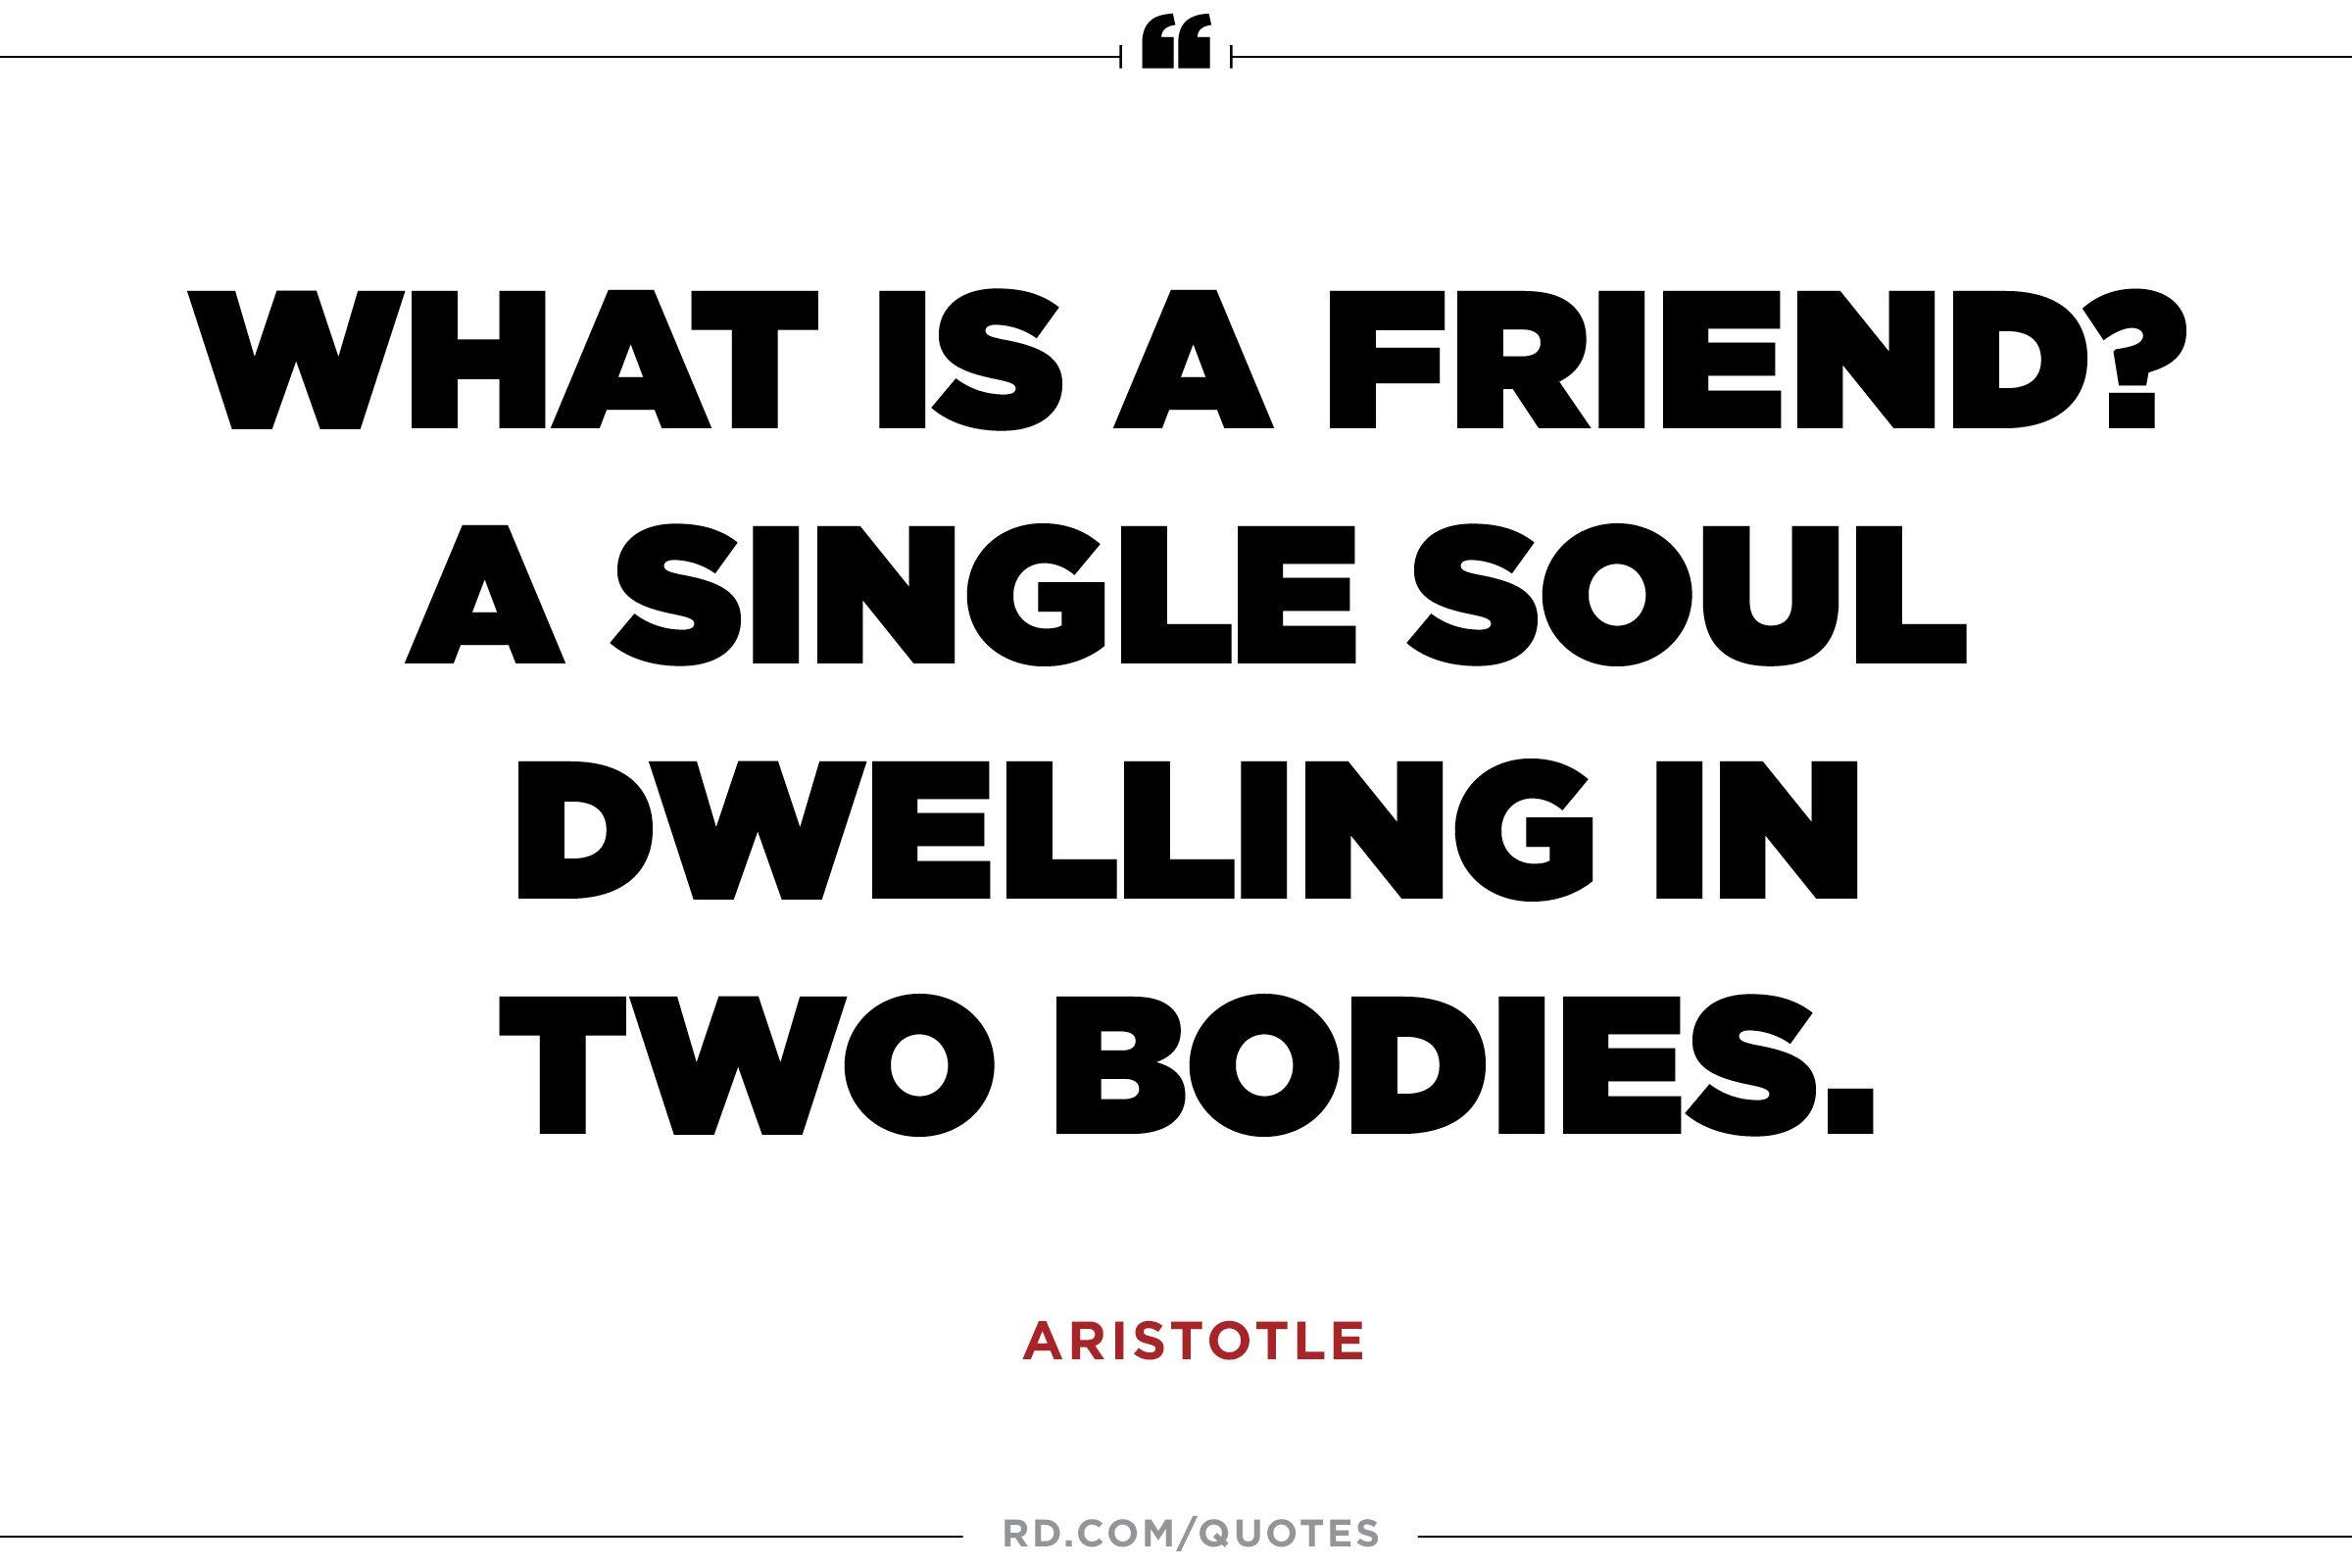 www.rd.com/wp-content/uploads/sites/2/2016/05/best-friend-quotes.jpg